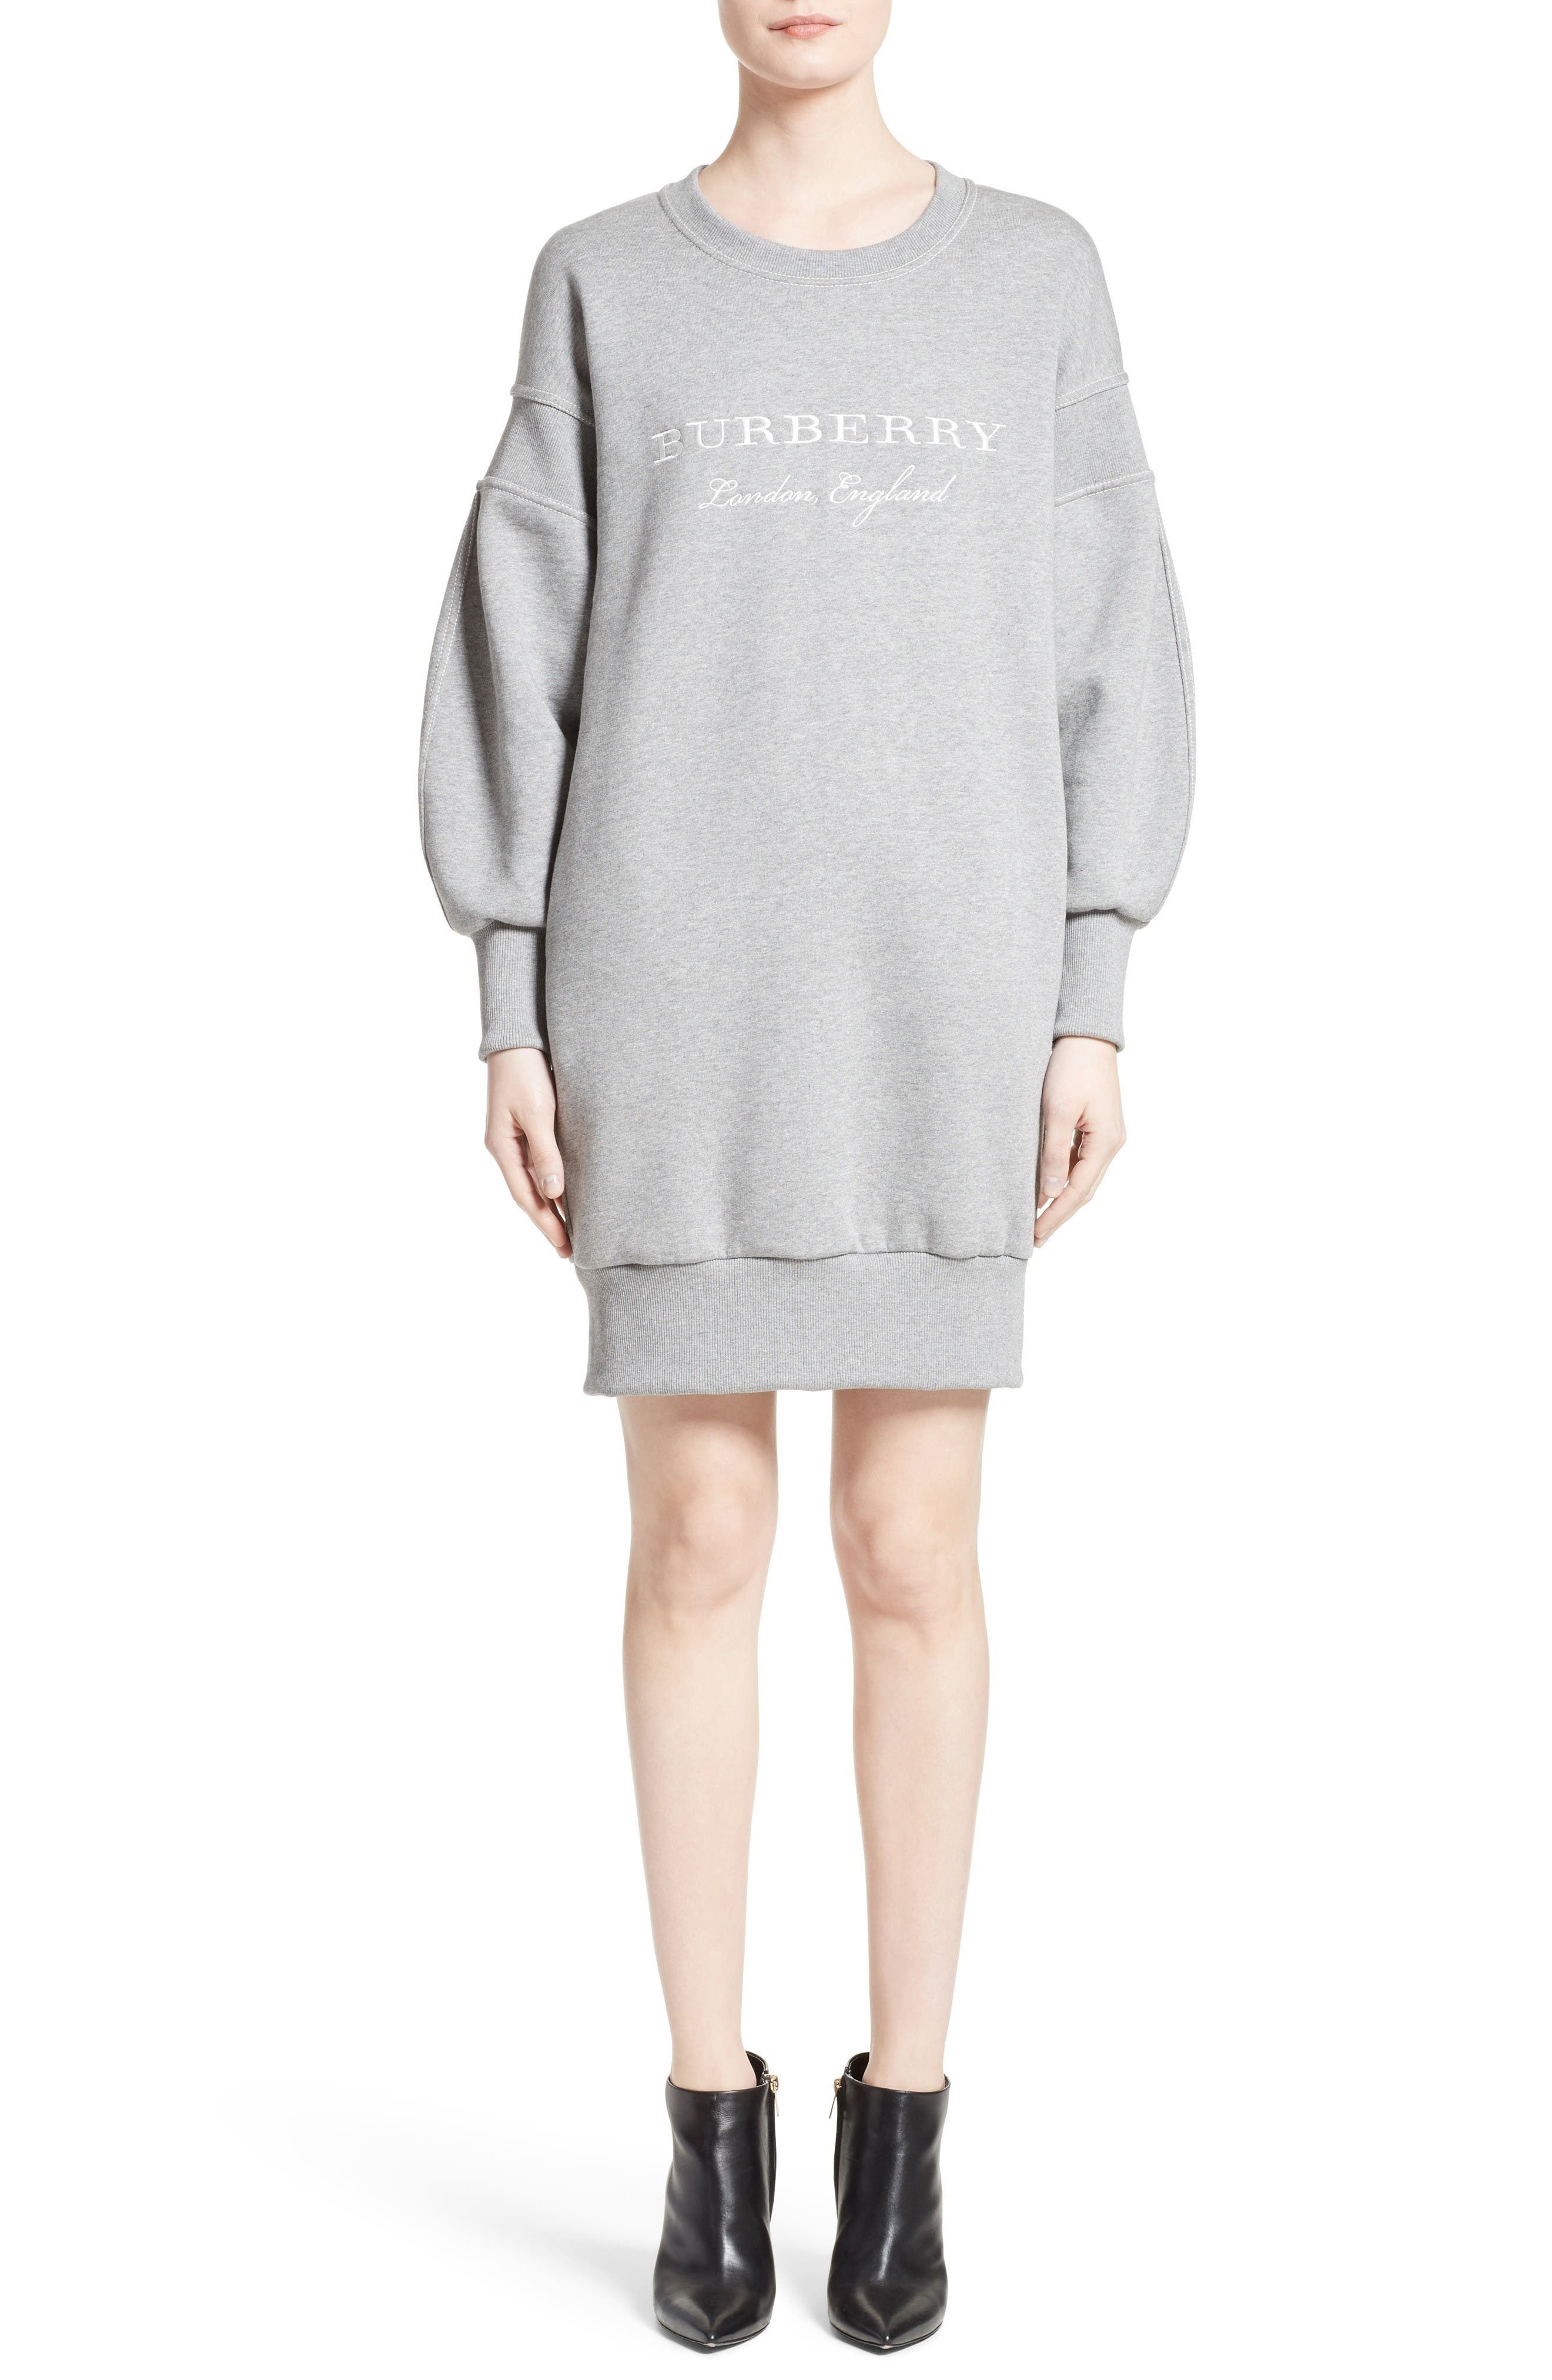 Burberry Soure Sweatshirt Dress